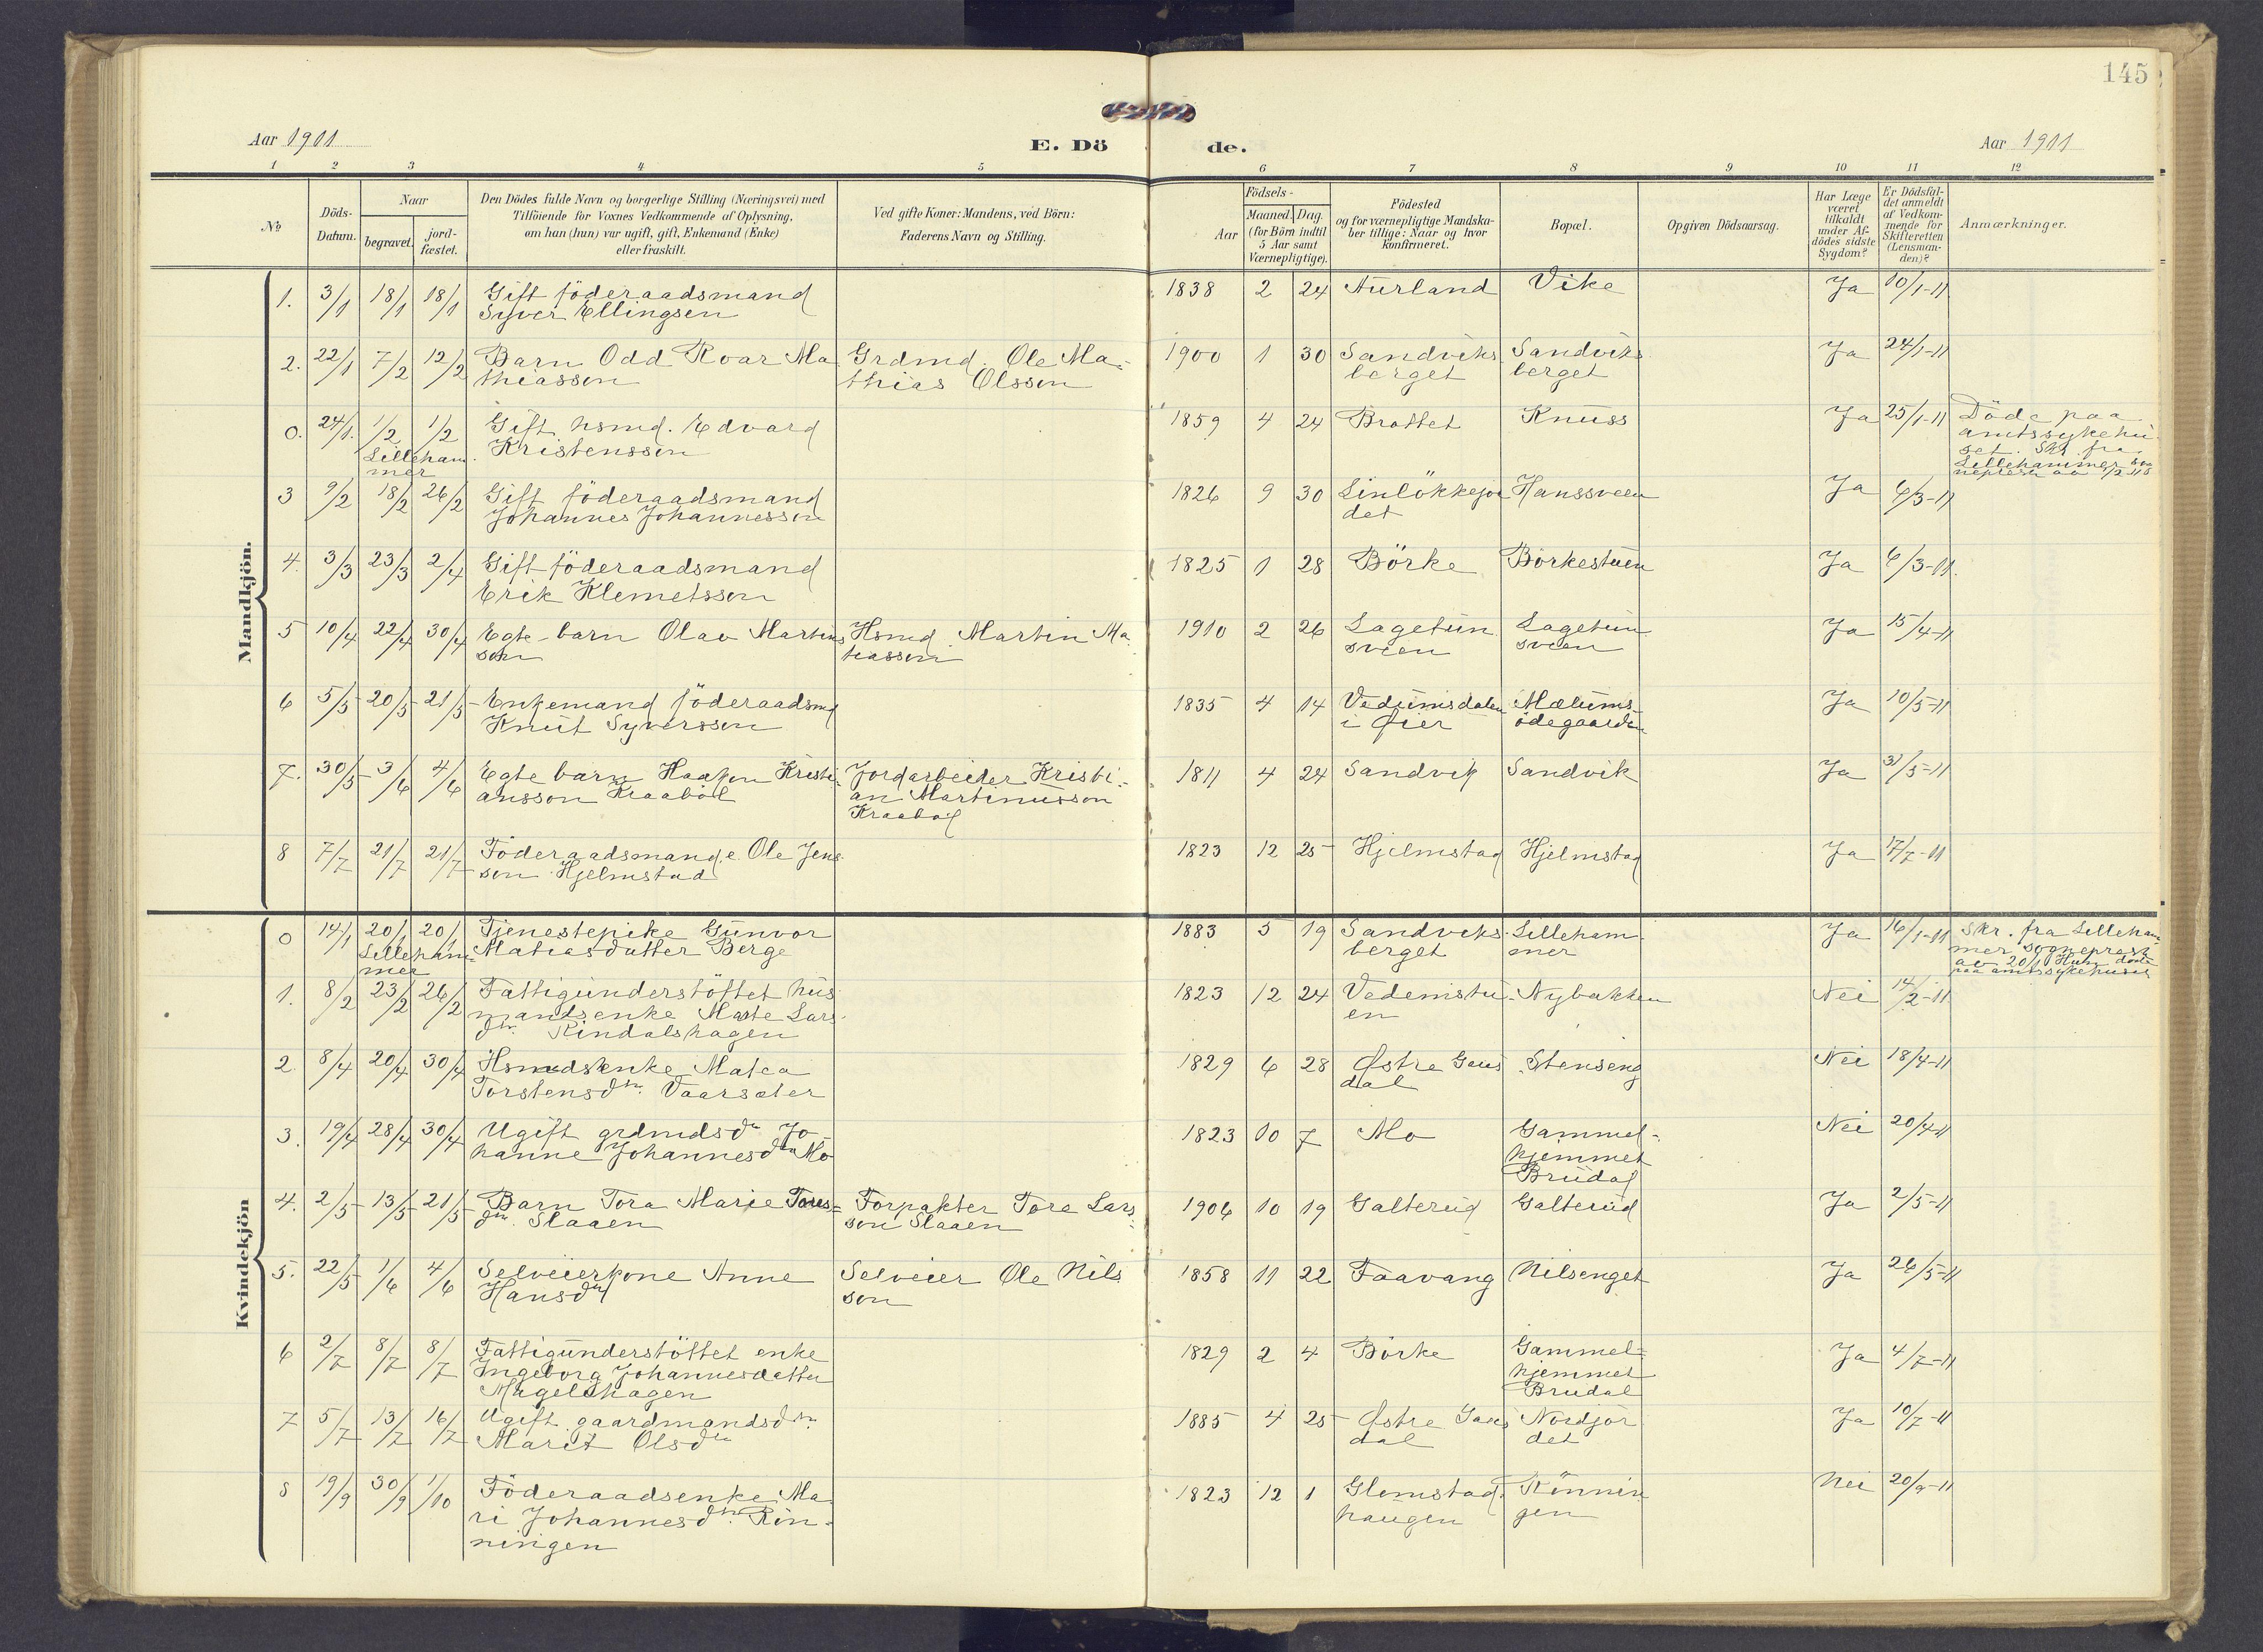 SAH, Øyer prestekontor, Ministerialbok nr. 13, 1905-1920, s. 145